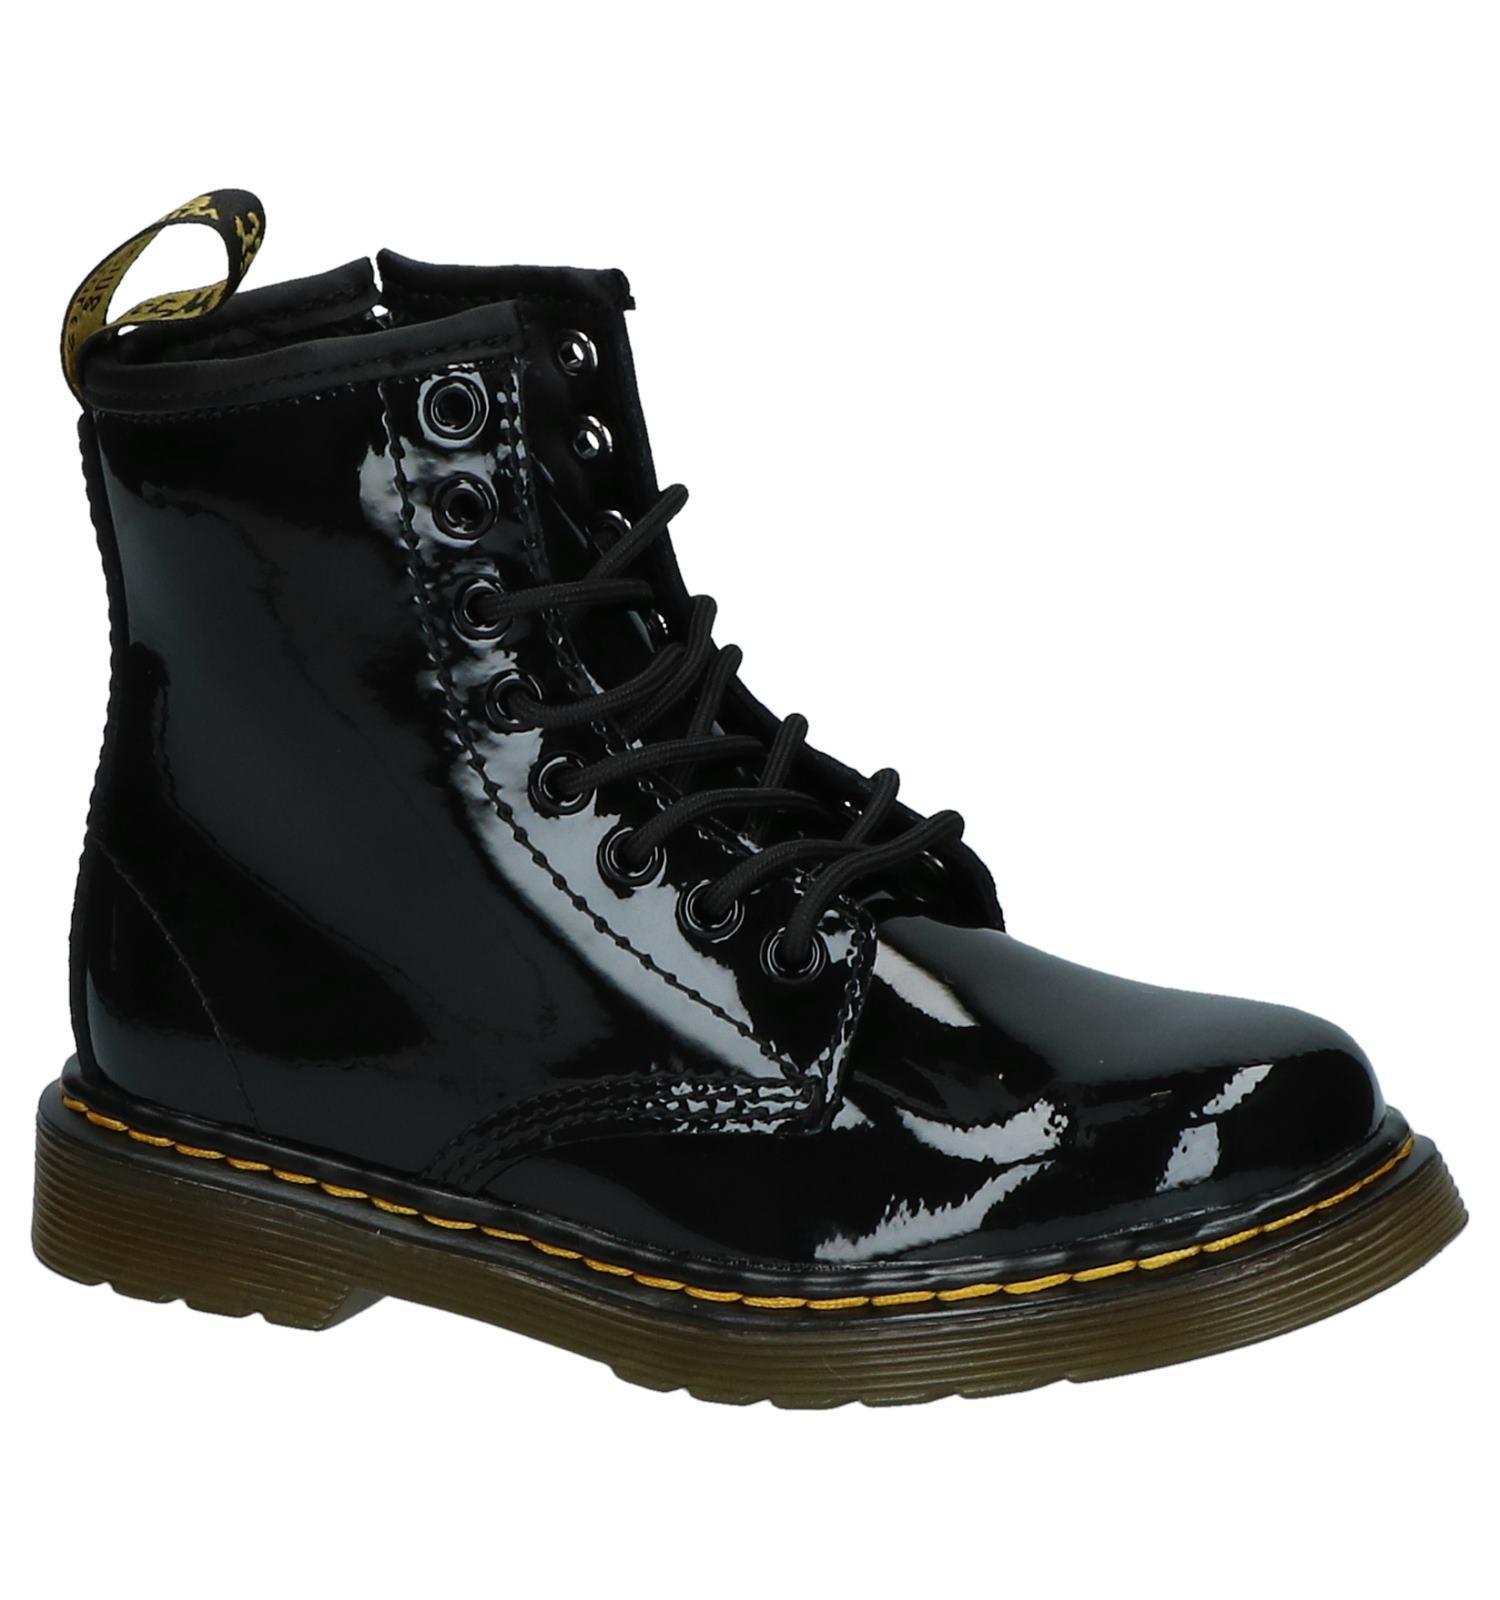 c862a3c3df2 Zwarte Stoere Boots Dr. Martens Delaney Rits/Veter | TORFS.BE | Gratis  verzend en retour